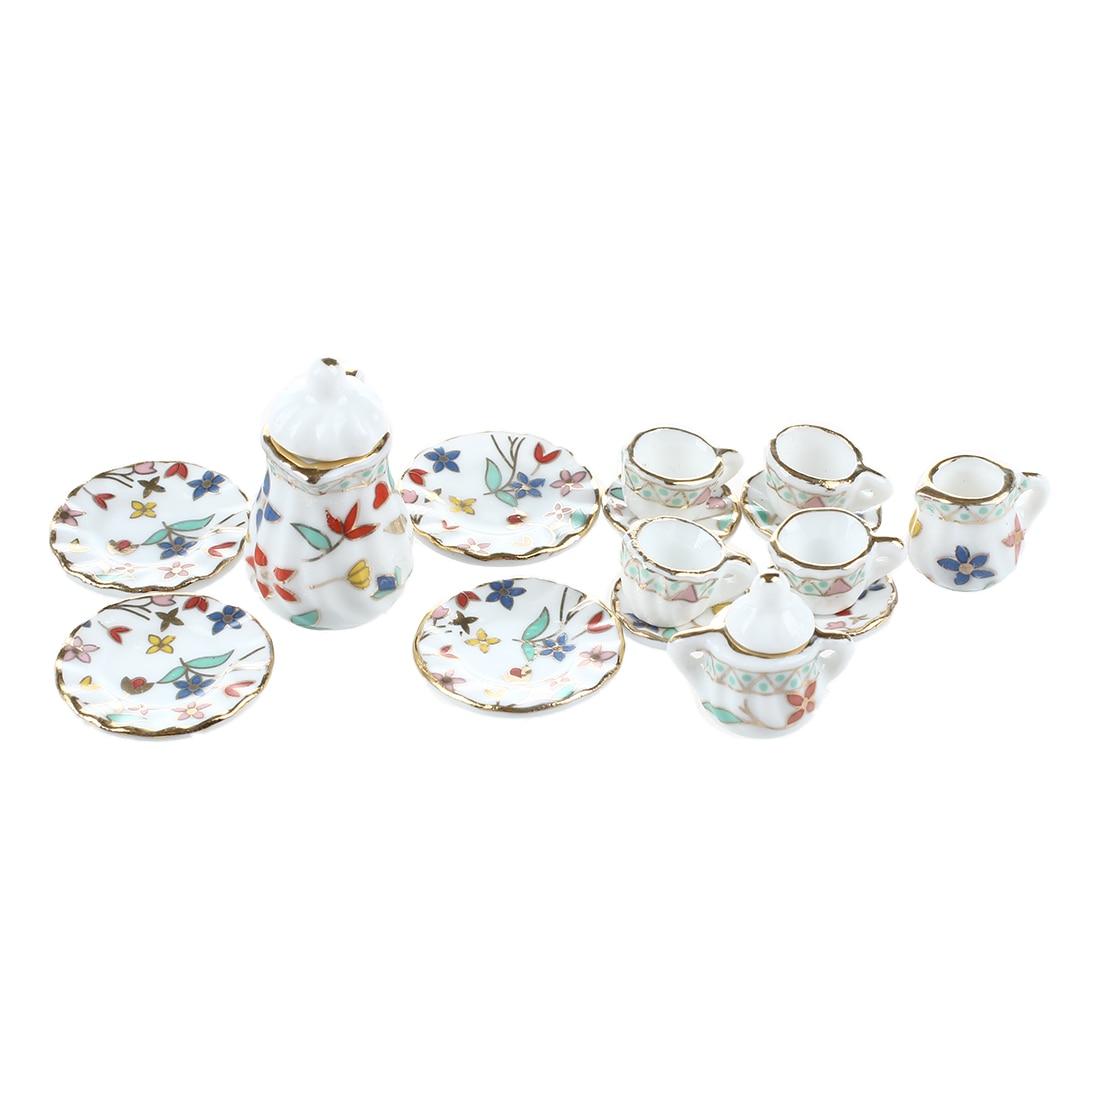 MACH 15 Piece Miniature Dollhouse Dinnerware Porcelain Tea Set Tableware Cup Plate Colorful Floral Print